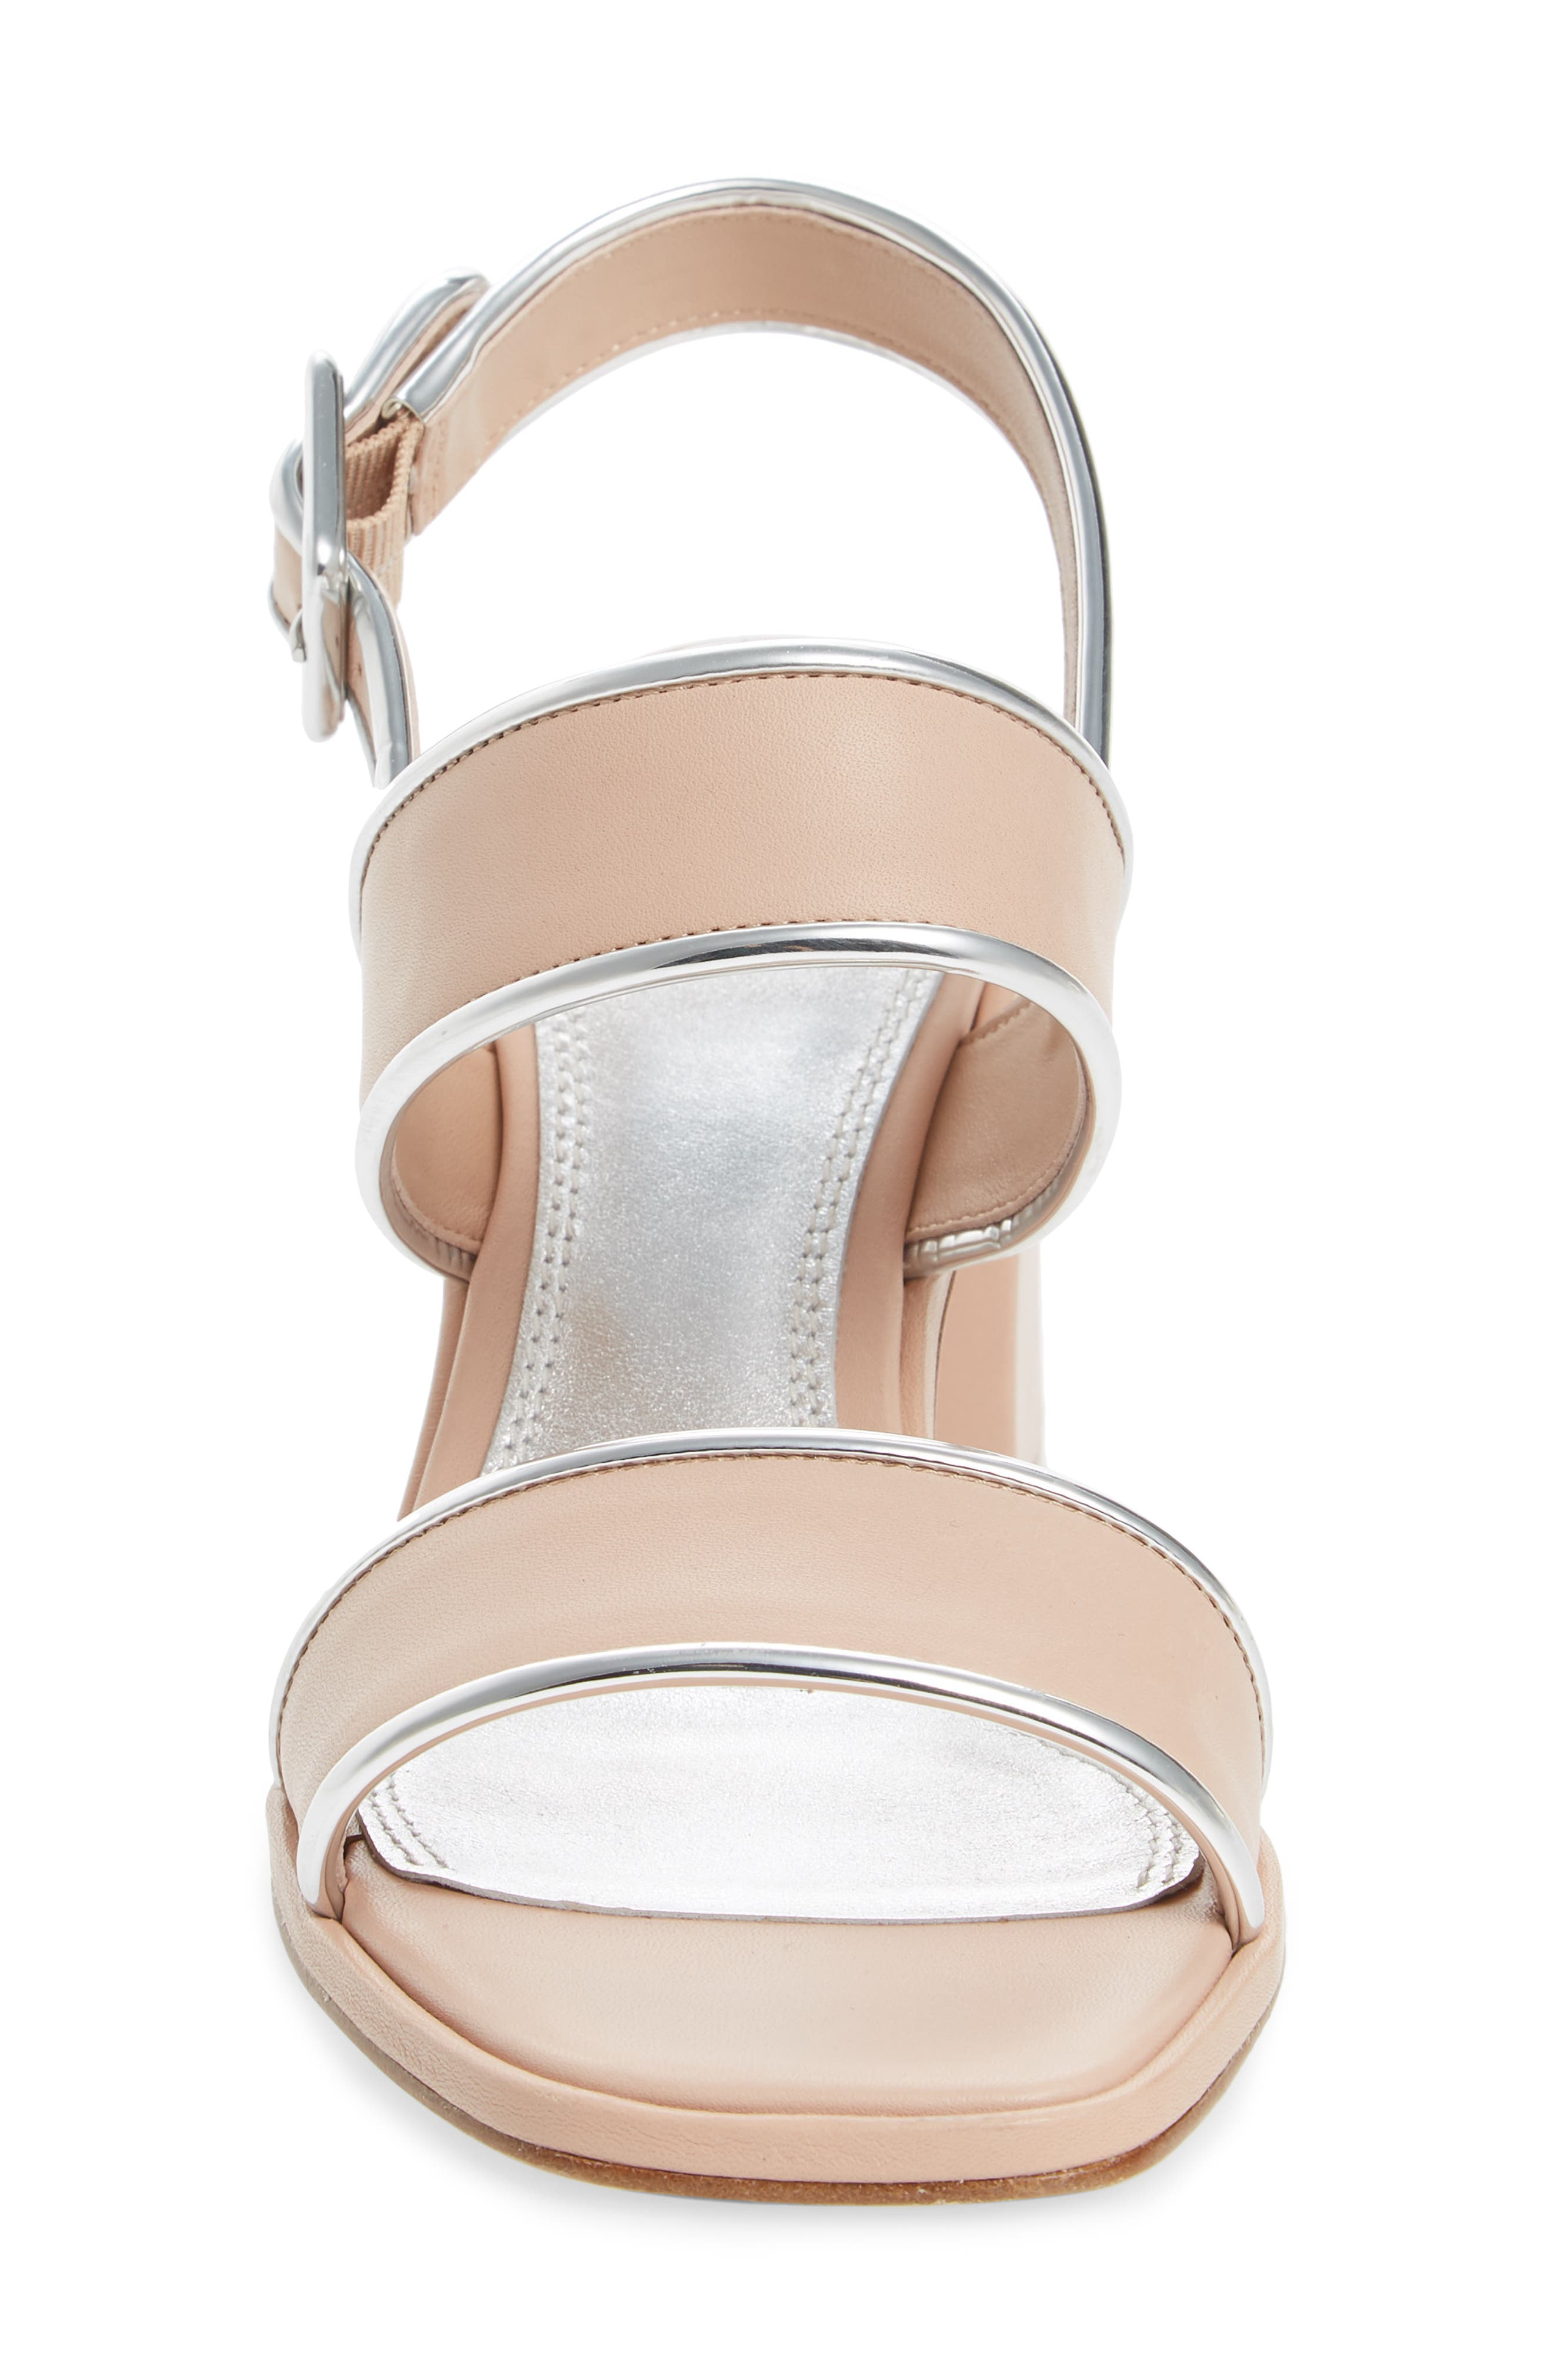 Delaney Double Strap Sandal,                             Alternate thumbnail 4, color,                             Goan Sand/ Silver